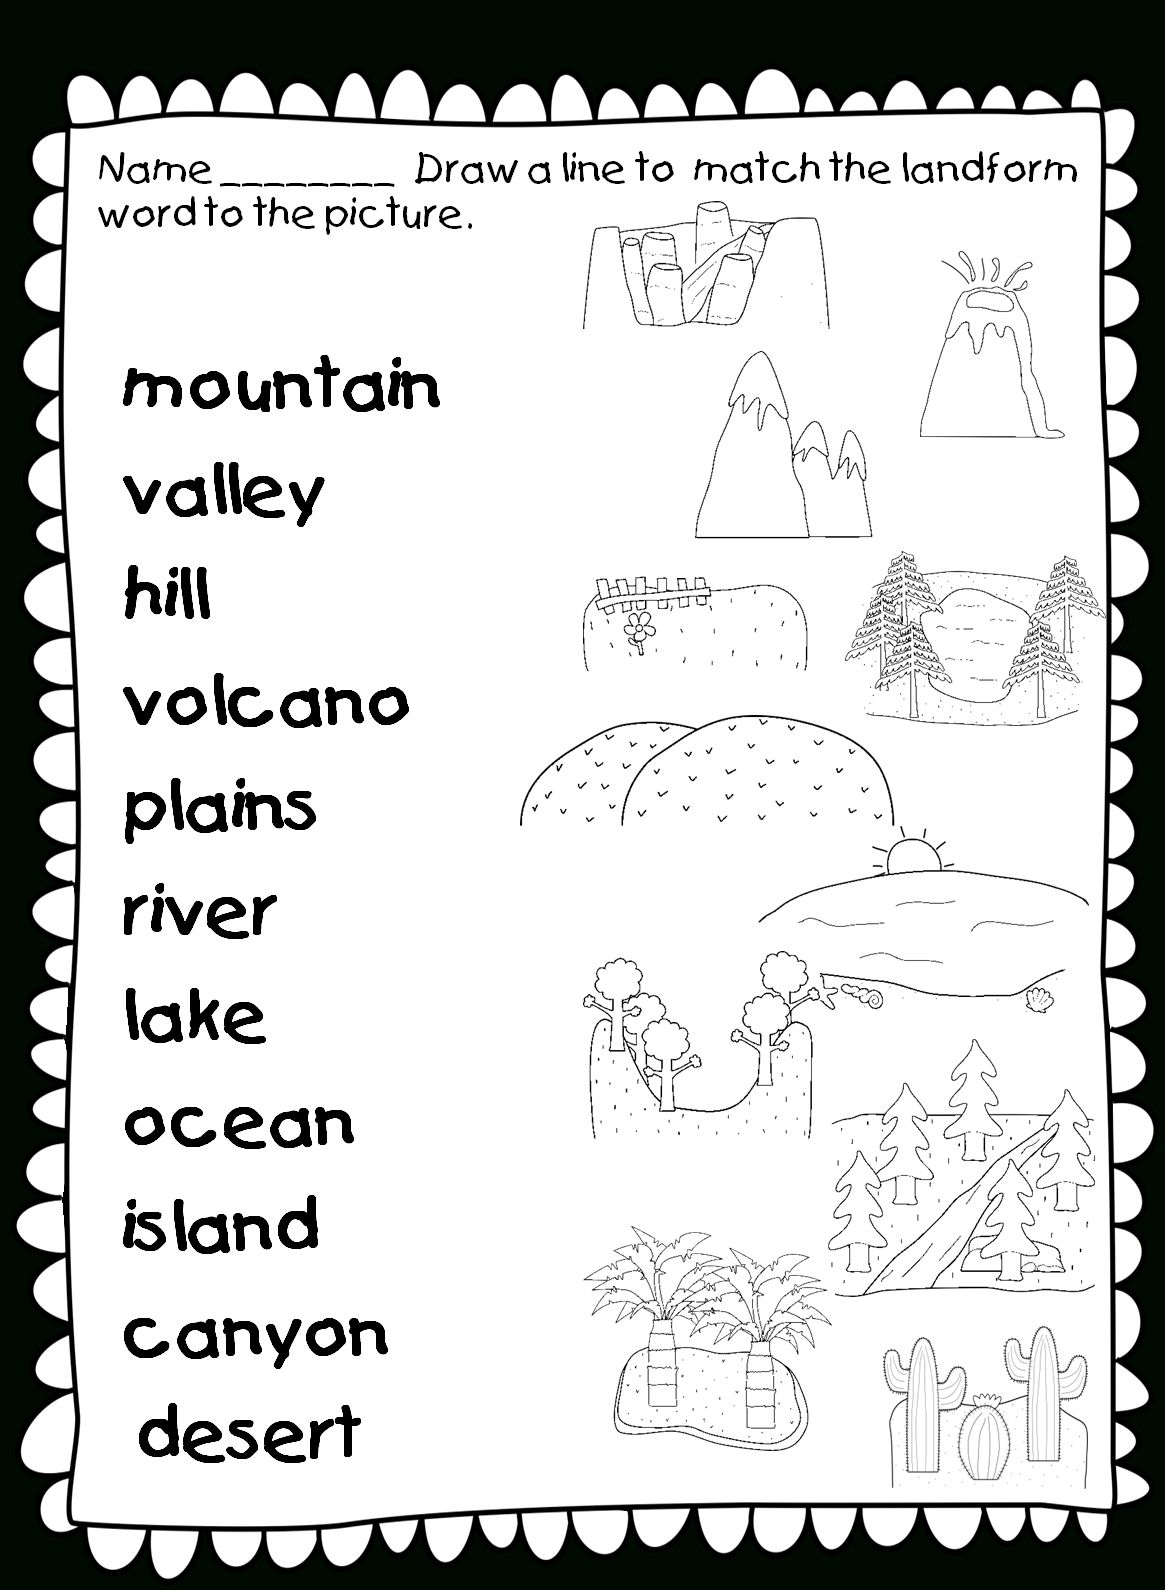 Landforms Visual Guide